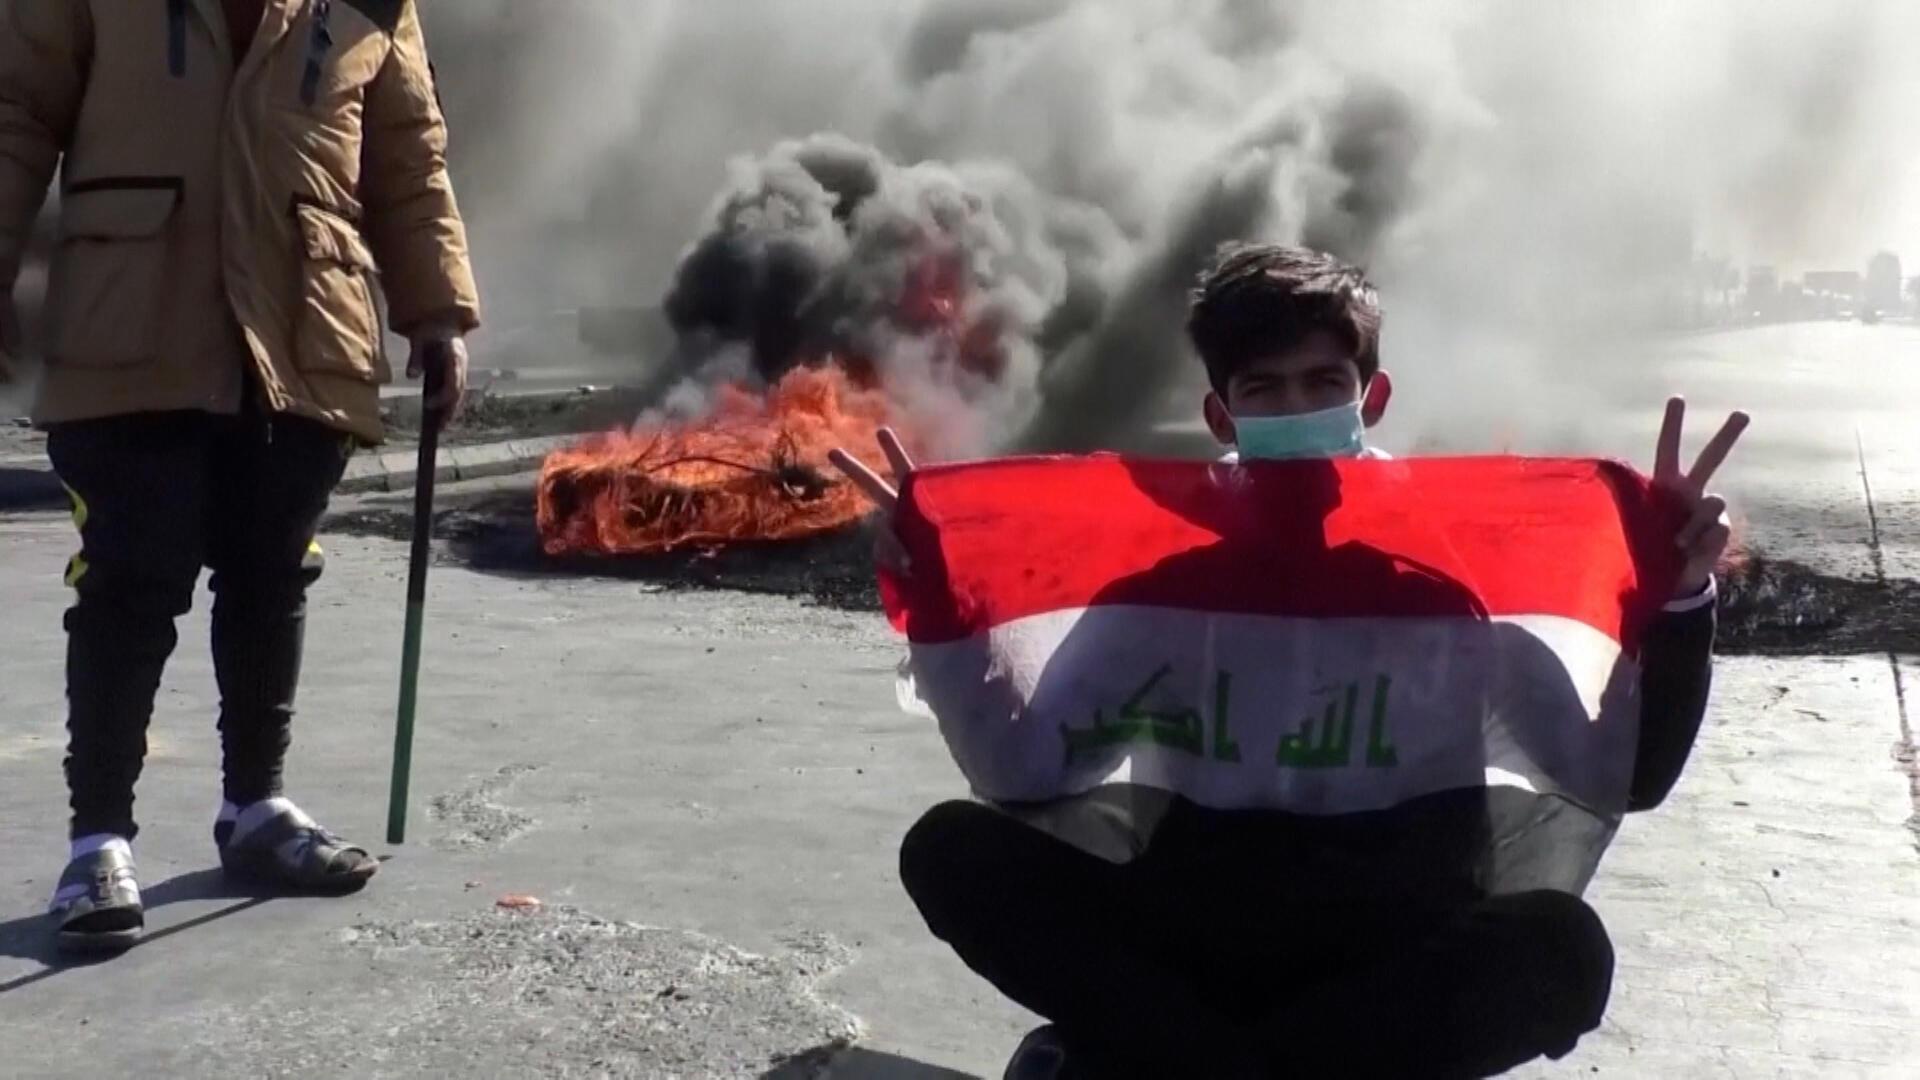 xx PUSH PICTURE RER IRAK_RETRO (0-00-00-00)